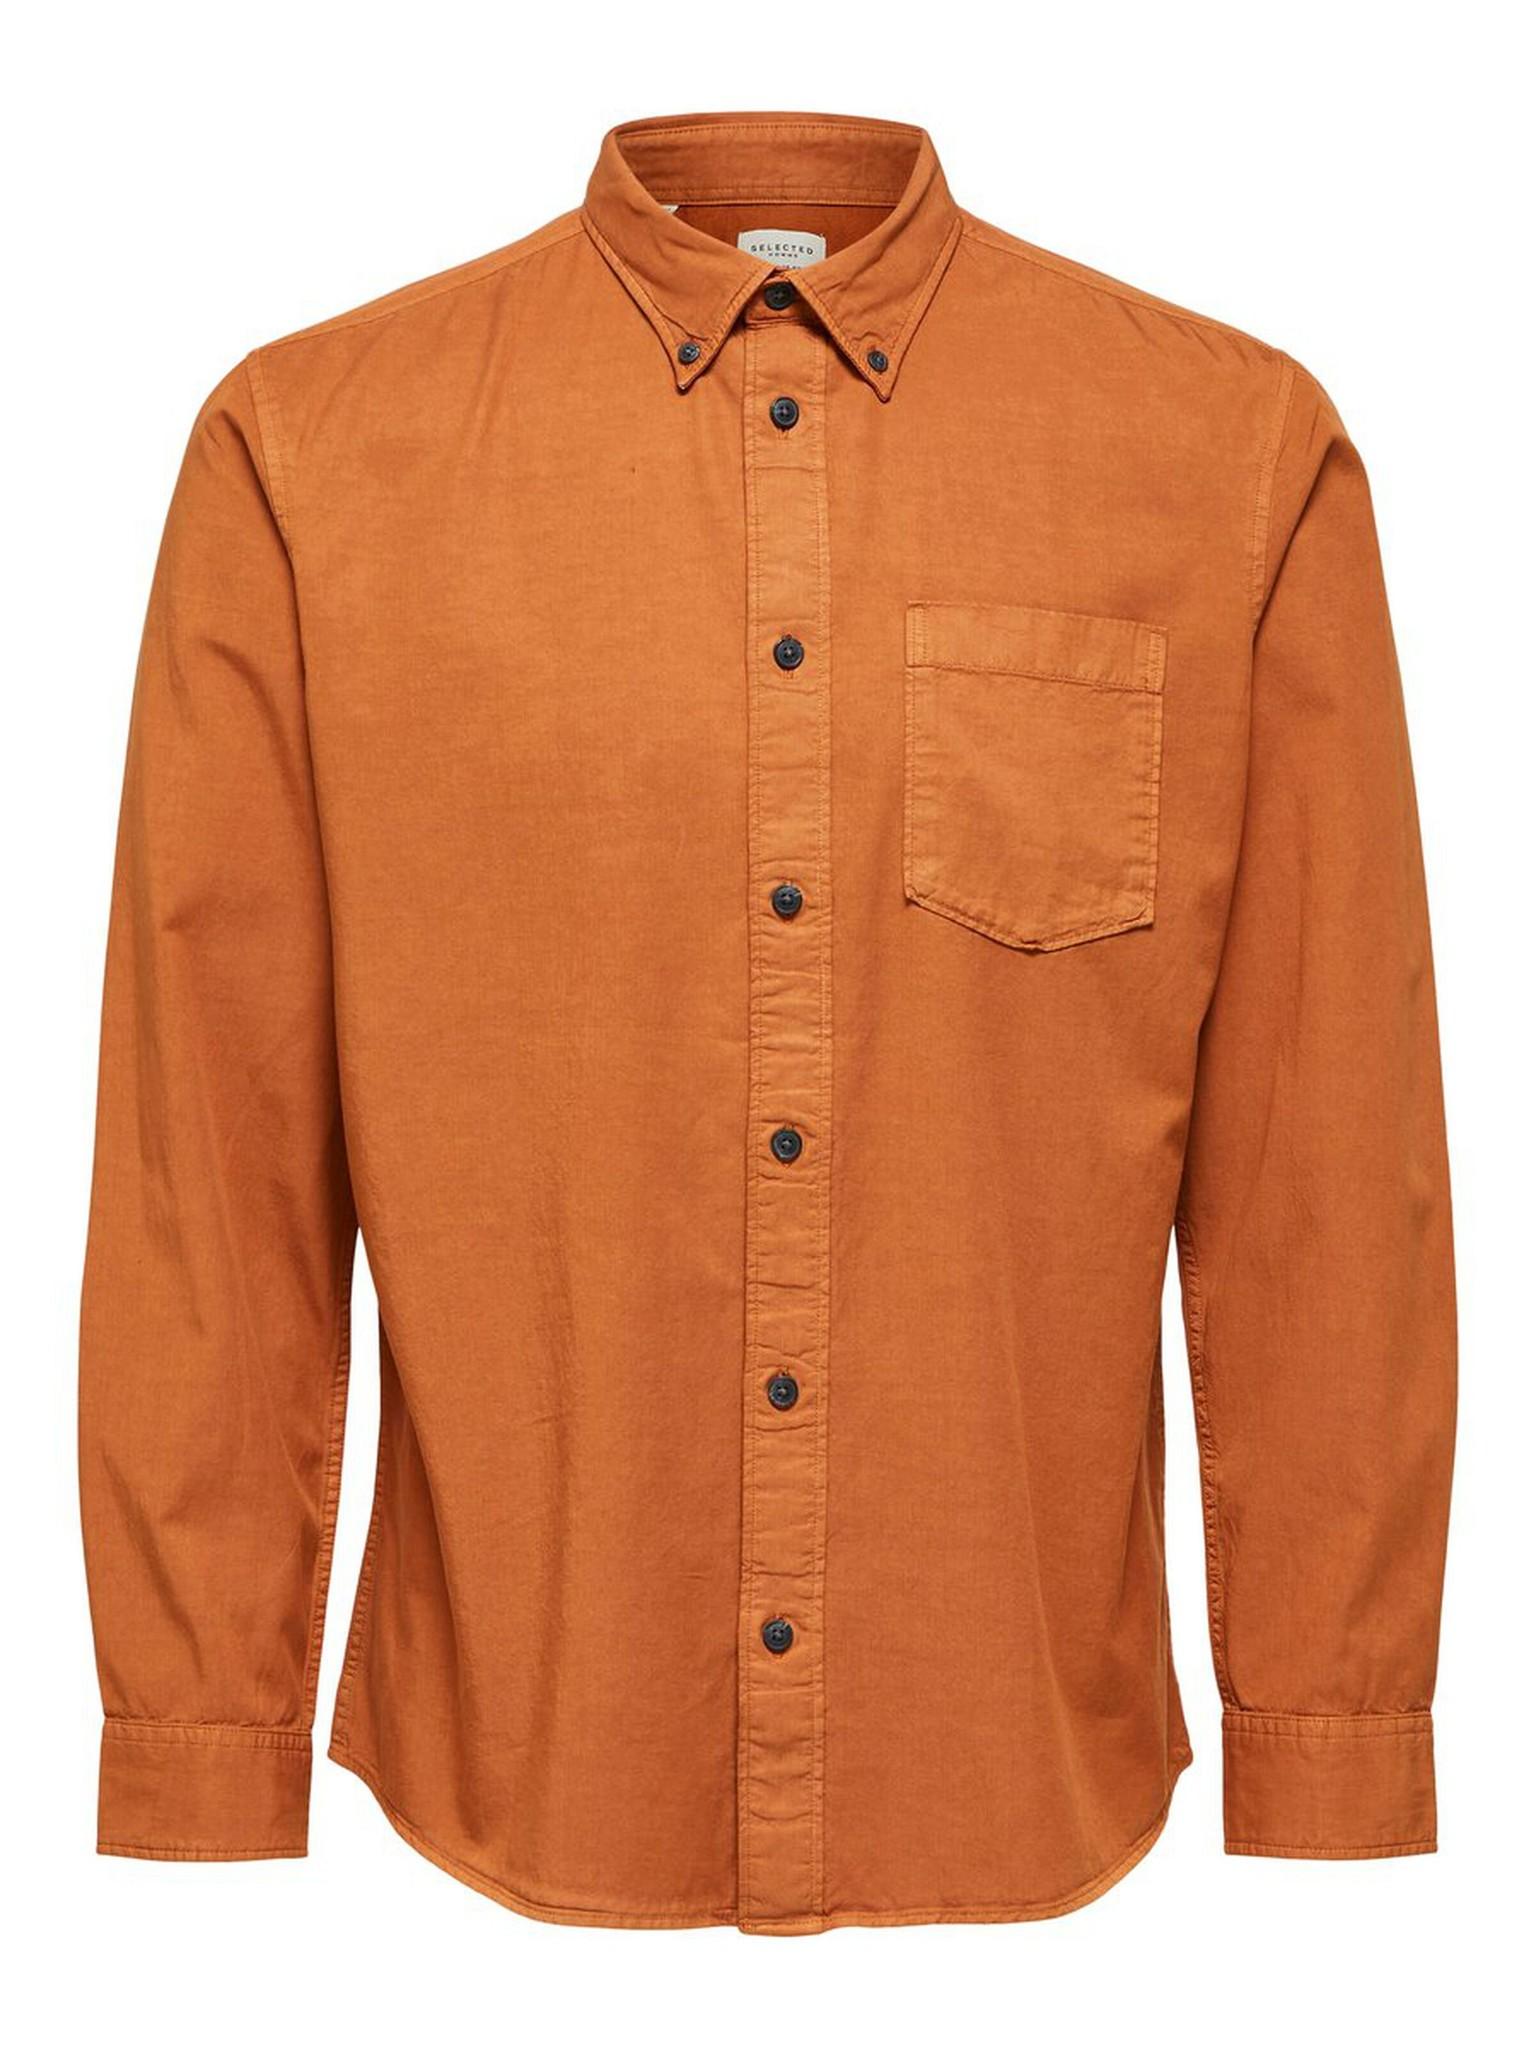 SELECTED chemise boutonnée-11